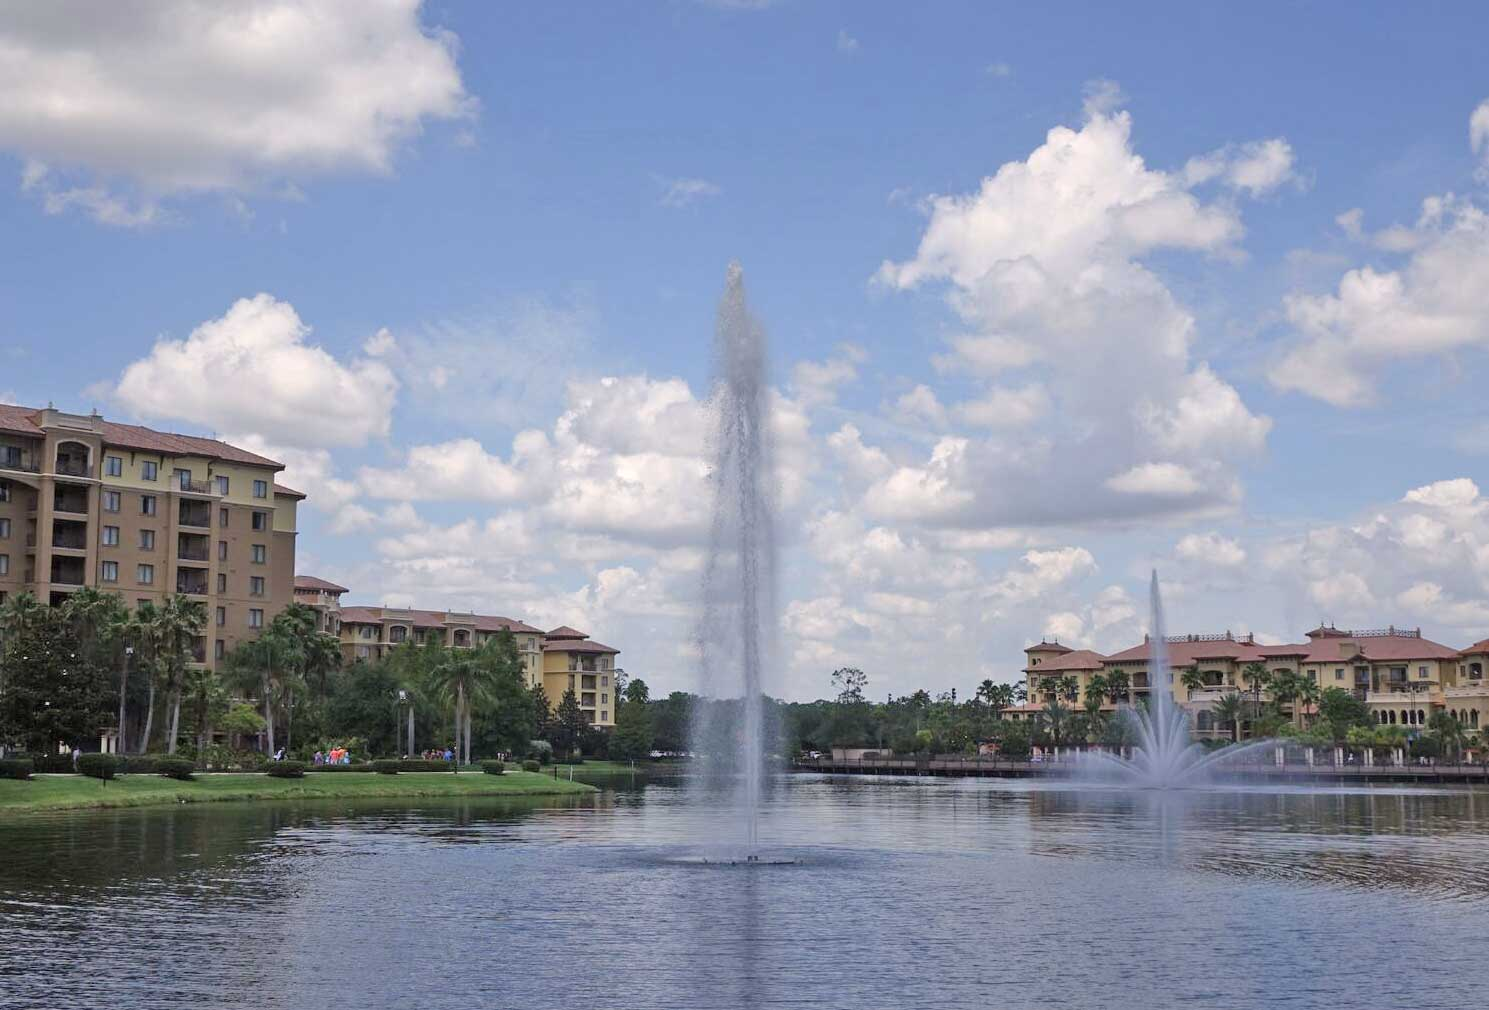 Best Hotels near Epcot - Wyndham Grand Orlando Bonnet Creek